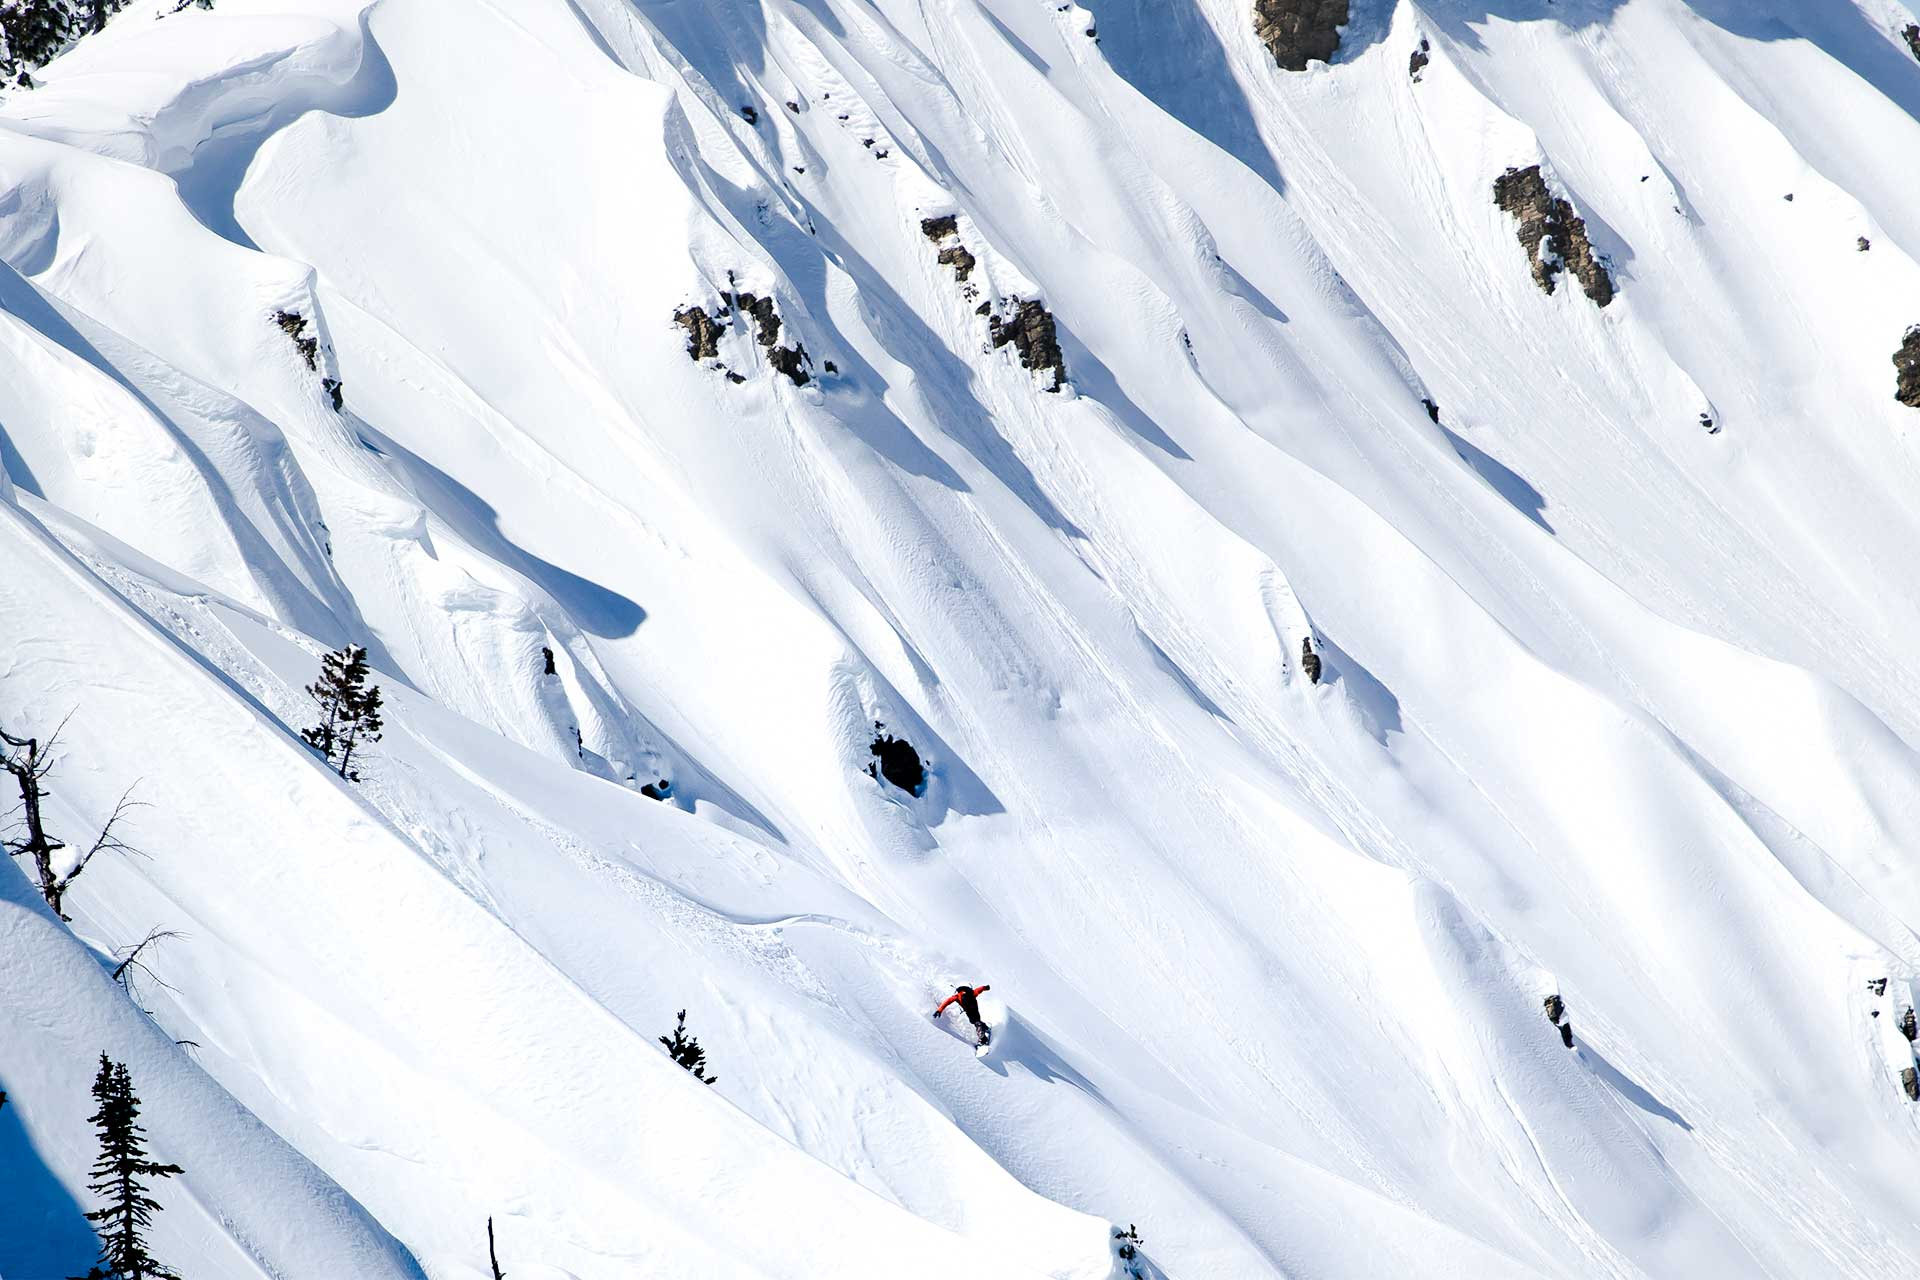 Snowboarder riding down through powder.